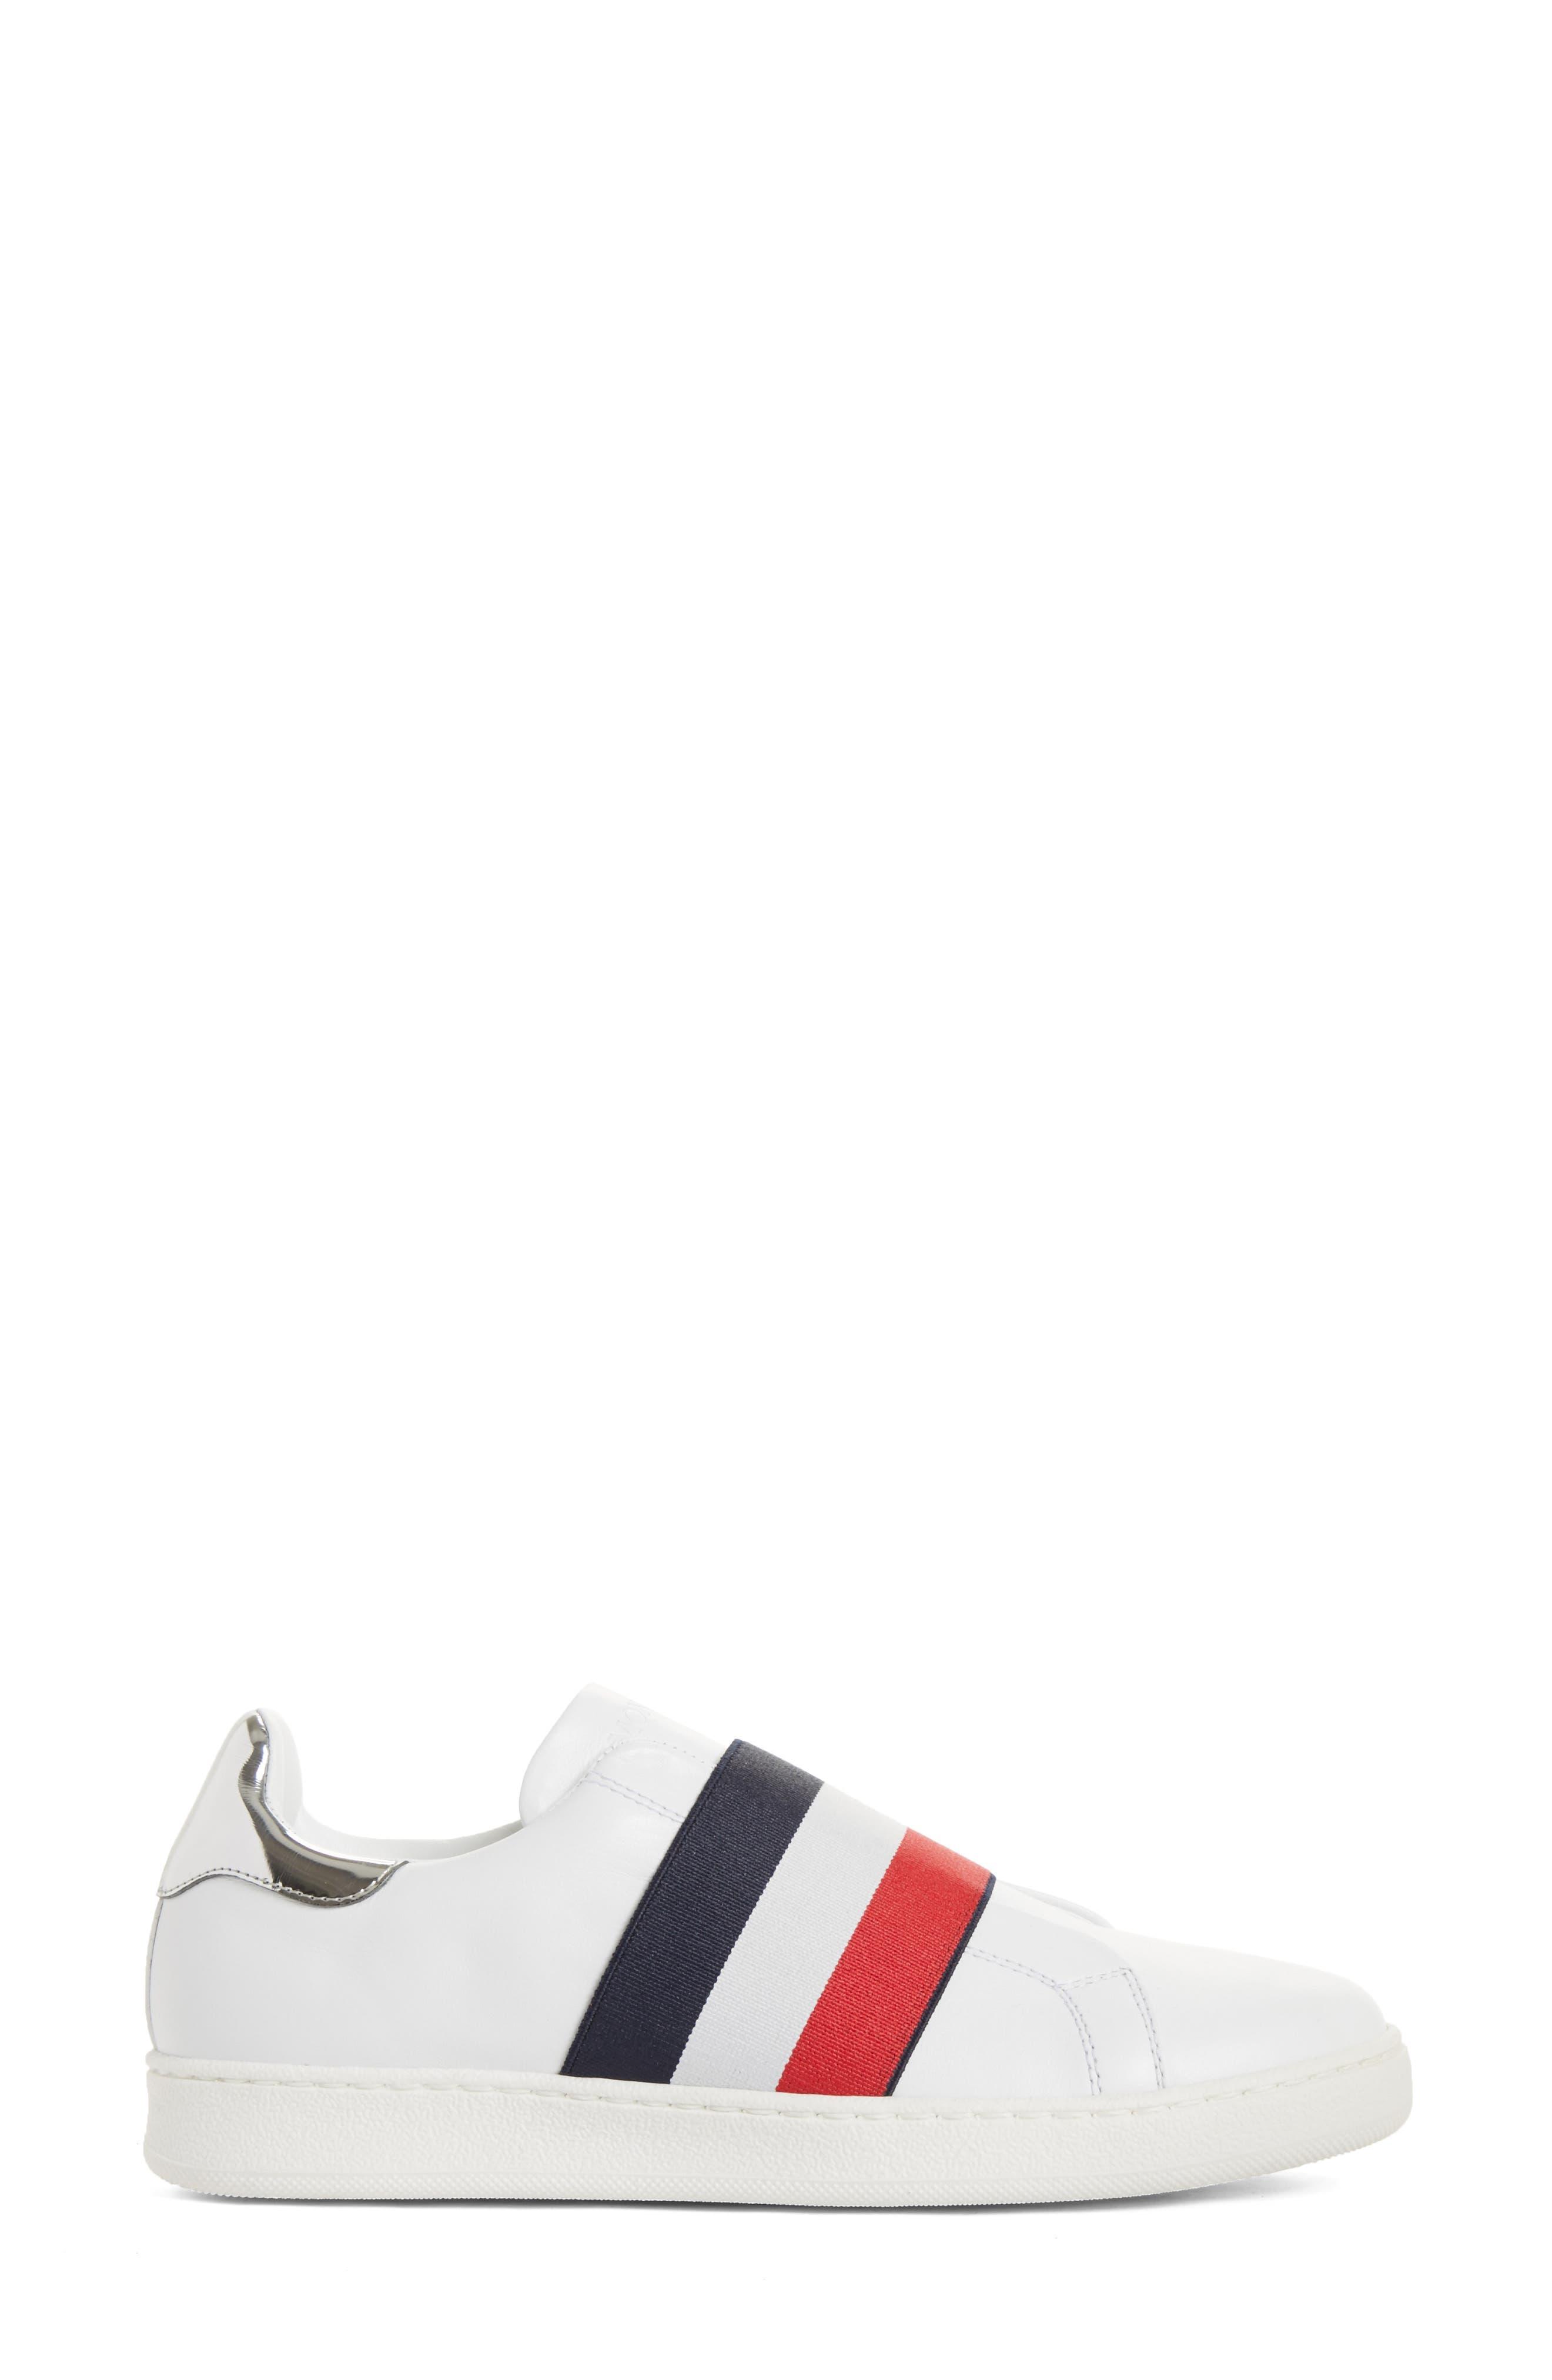 Alternate Image 3  - Moncler Alizee Low Top Sneaker (Women)